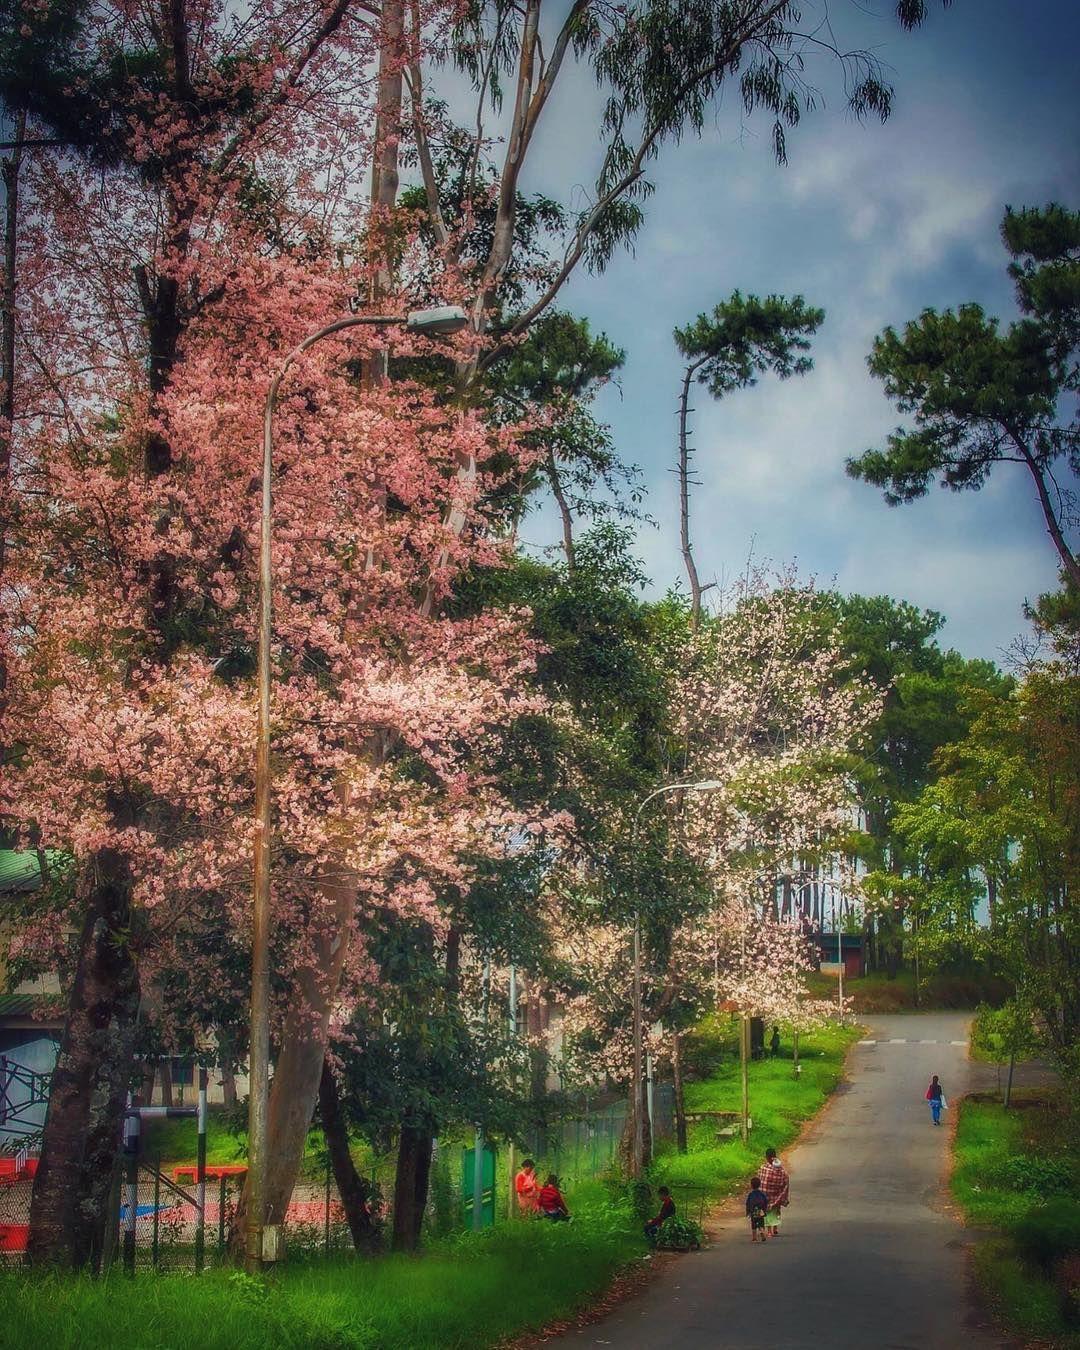 Shillong S International Cherry Blossom Festival Pics Are More Breathtaking Than The Delhi Smog Northeast India Cherry Blossom Festival Shillong